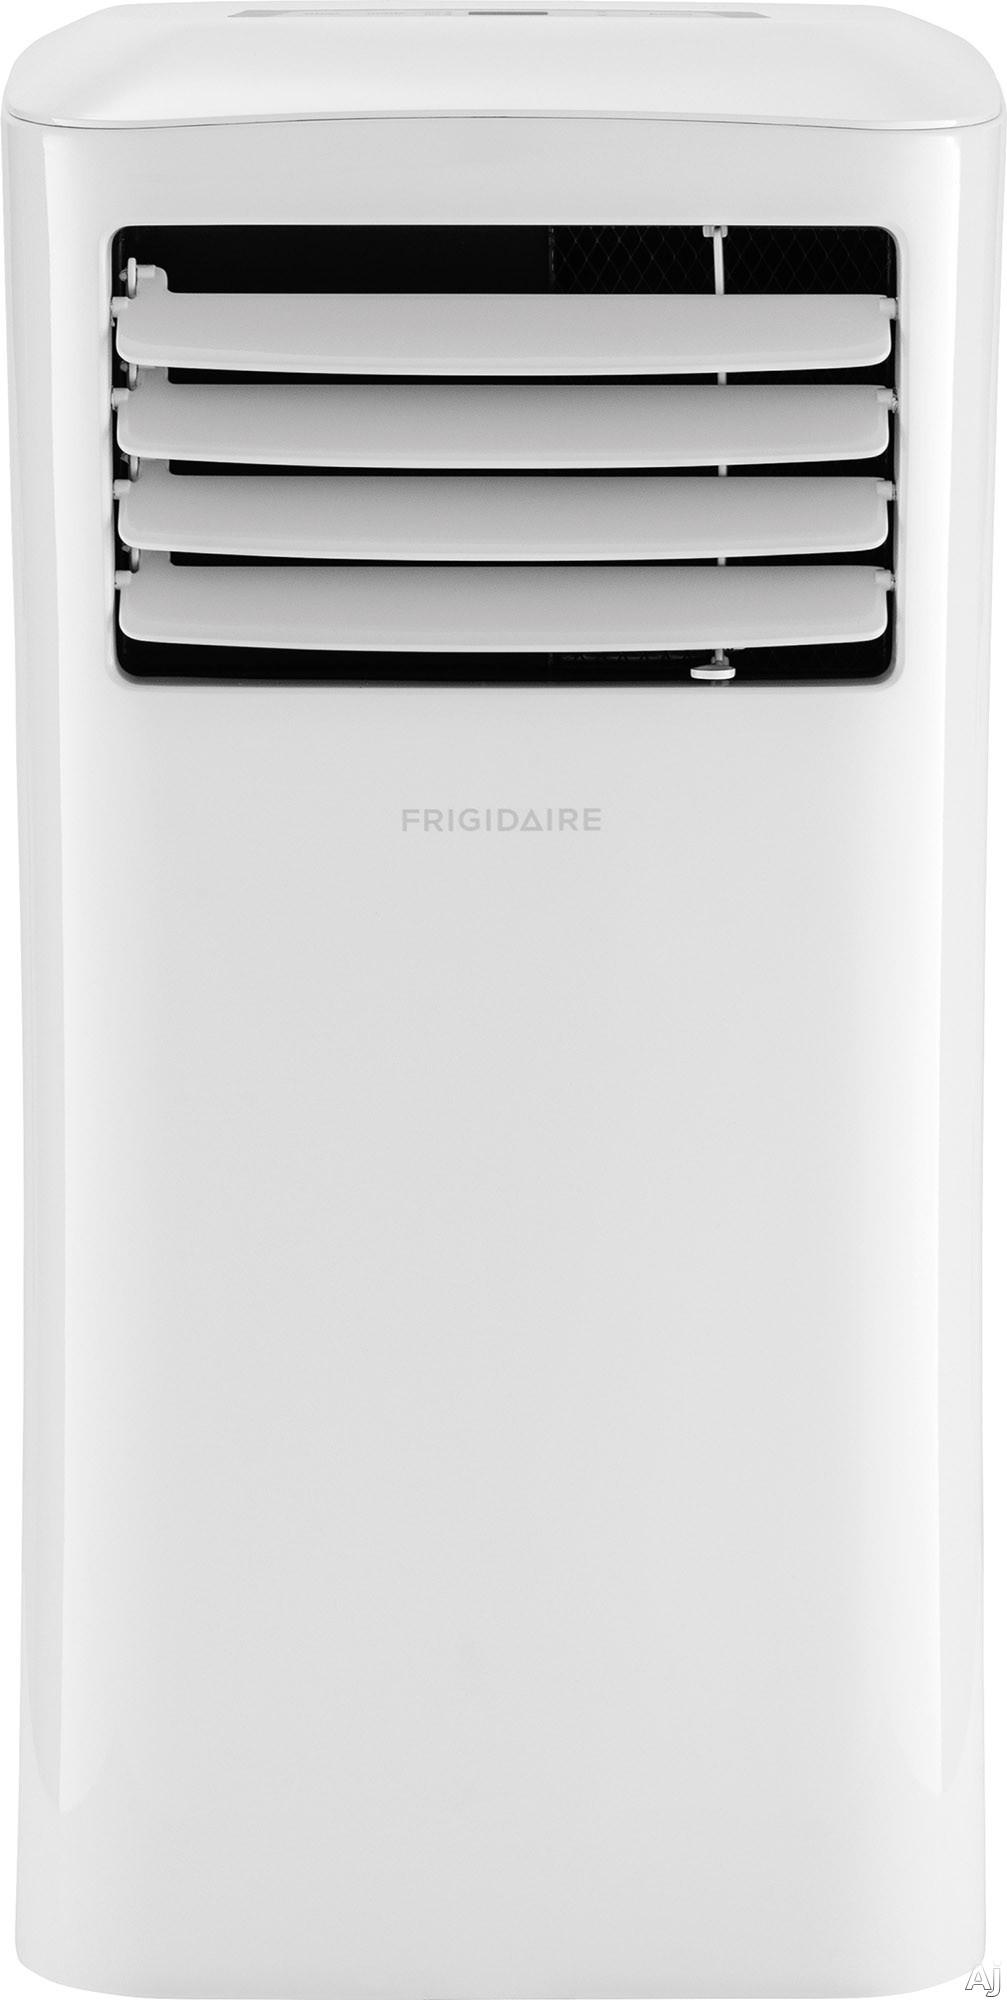 Frigidaire FFPA1022R1 10,000 BTU Portable Air Conditioner in White with 369 CFM 15948